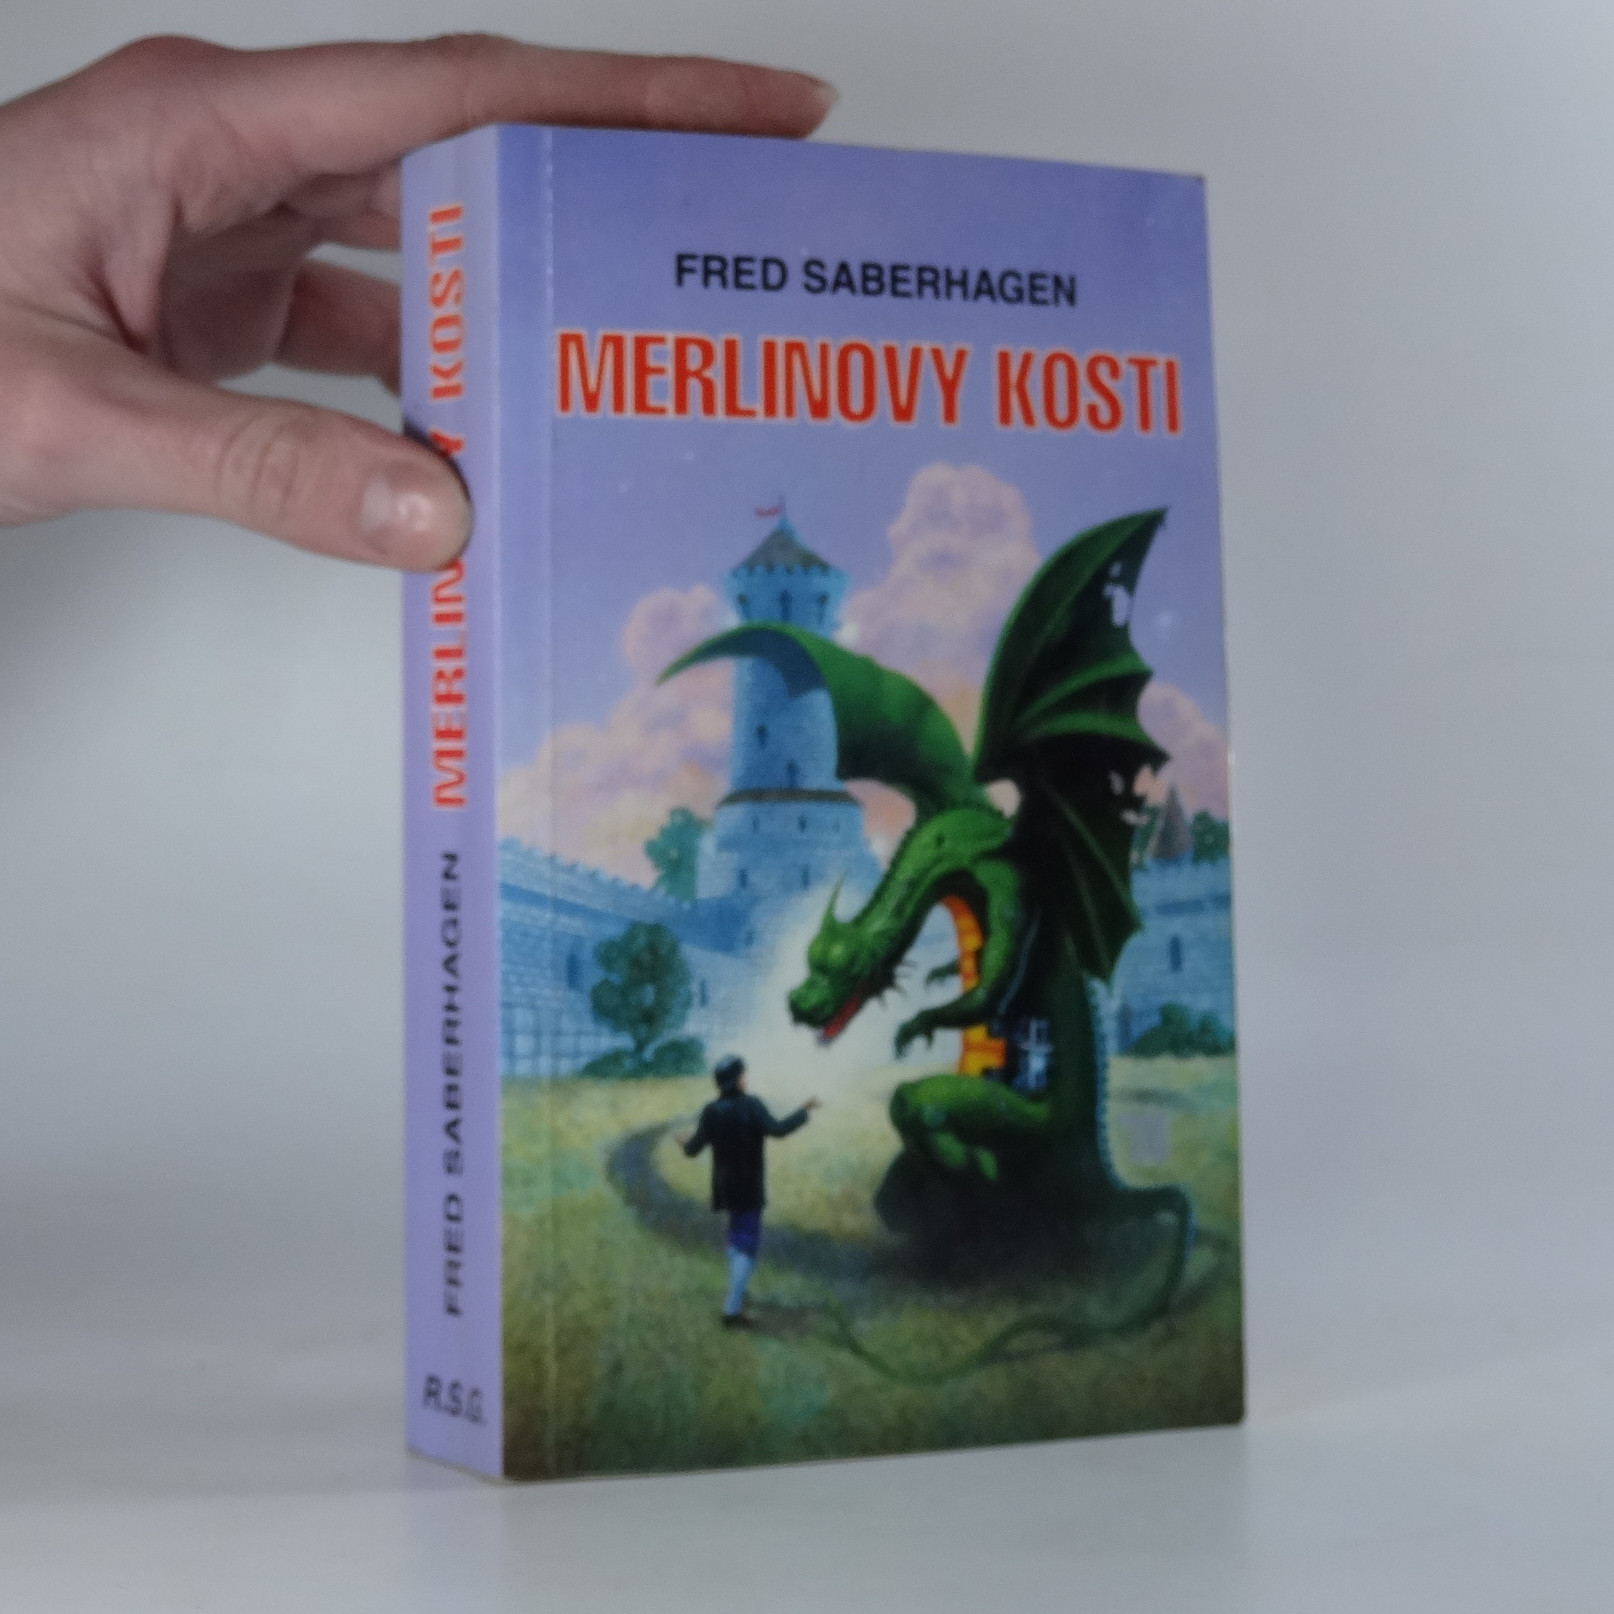 antikvární kniha Merlinovy kosti, 1997